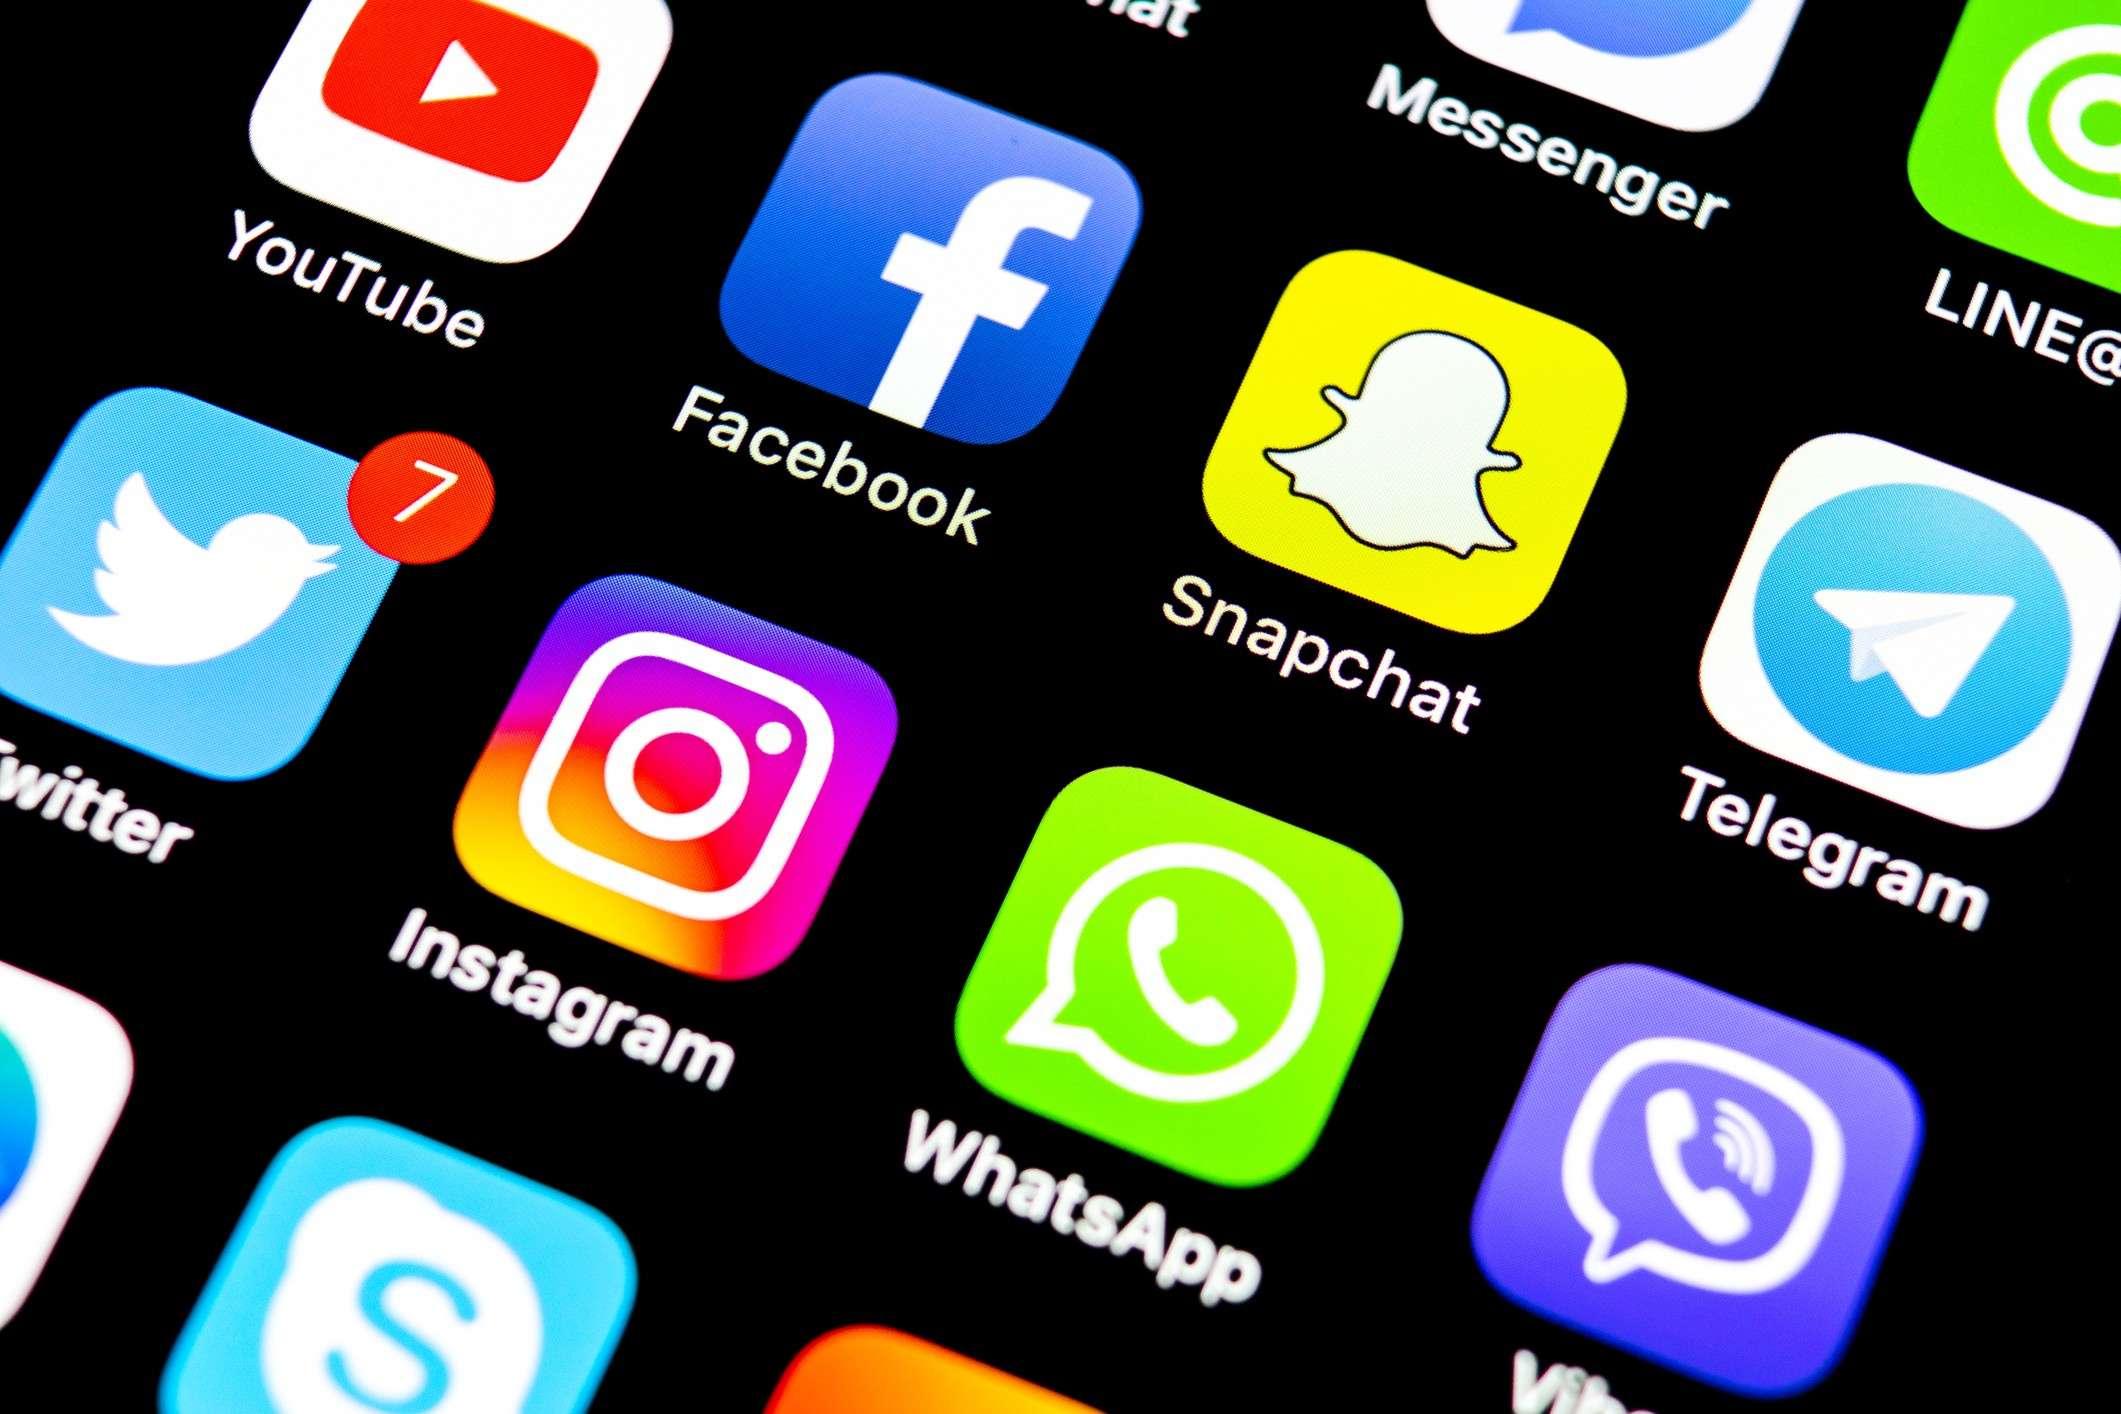 Social media companies must stop silencing marginalized groups